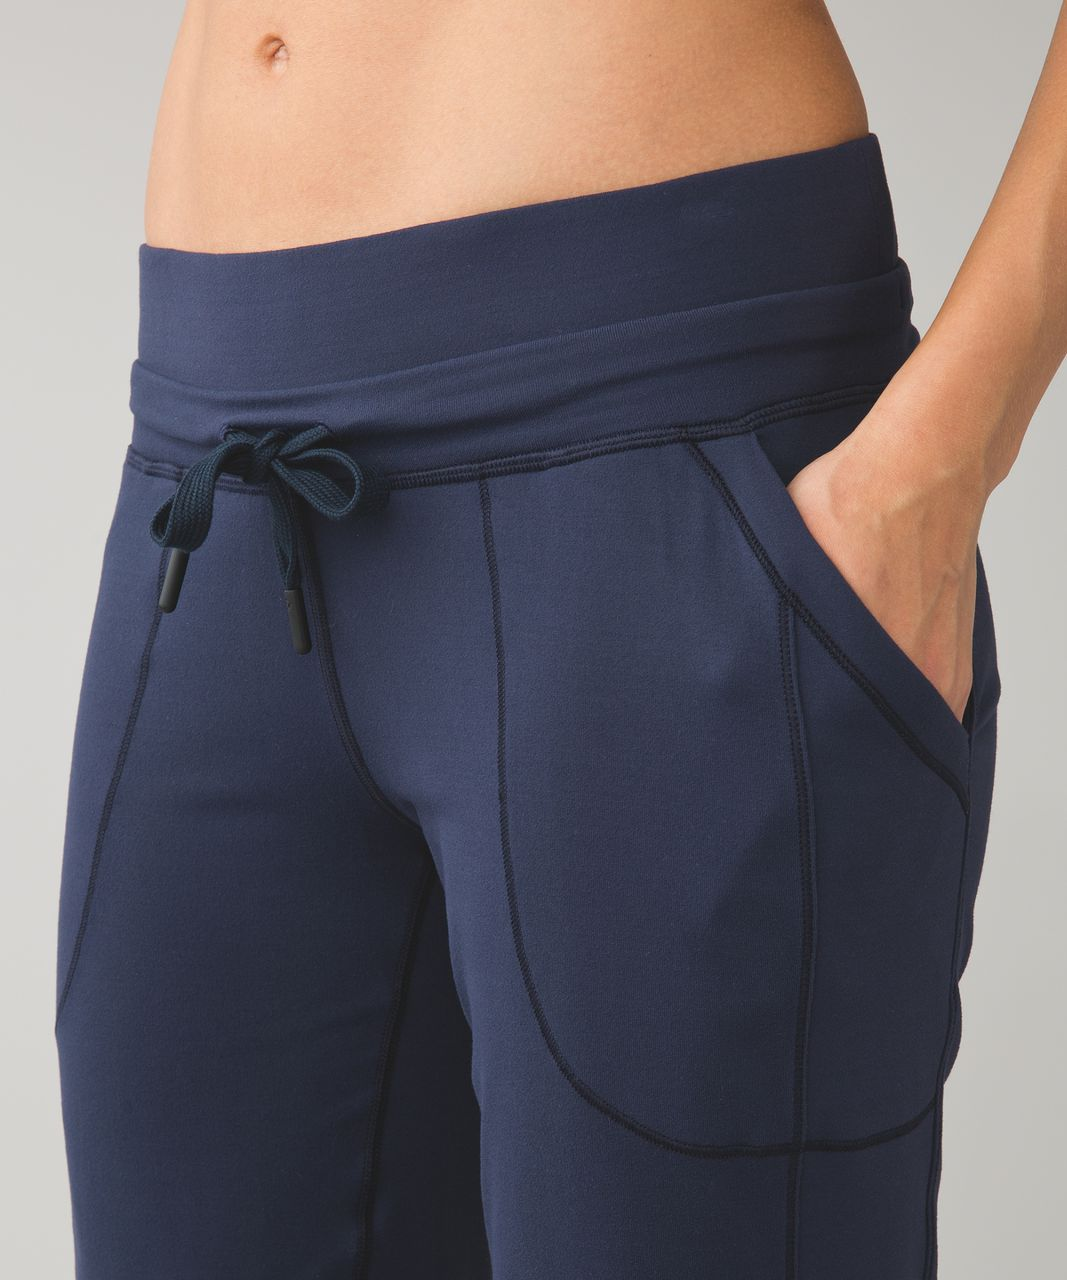 Lululemon Base Runner Pant III - Inkwell / Wee Stripe Inkwell Heathered Inkwell / Inkwell